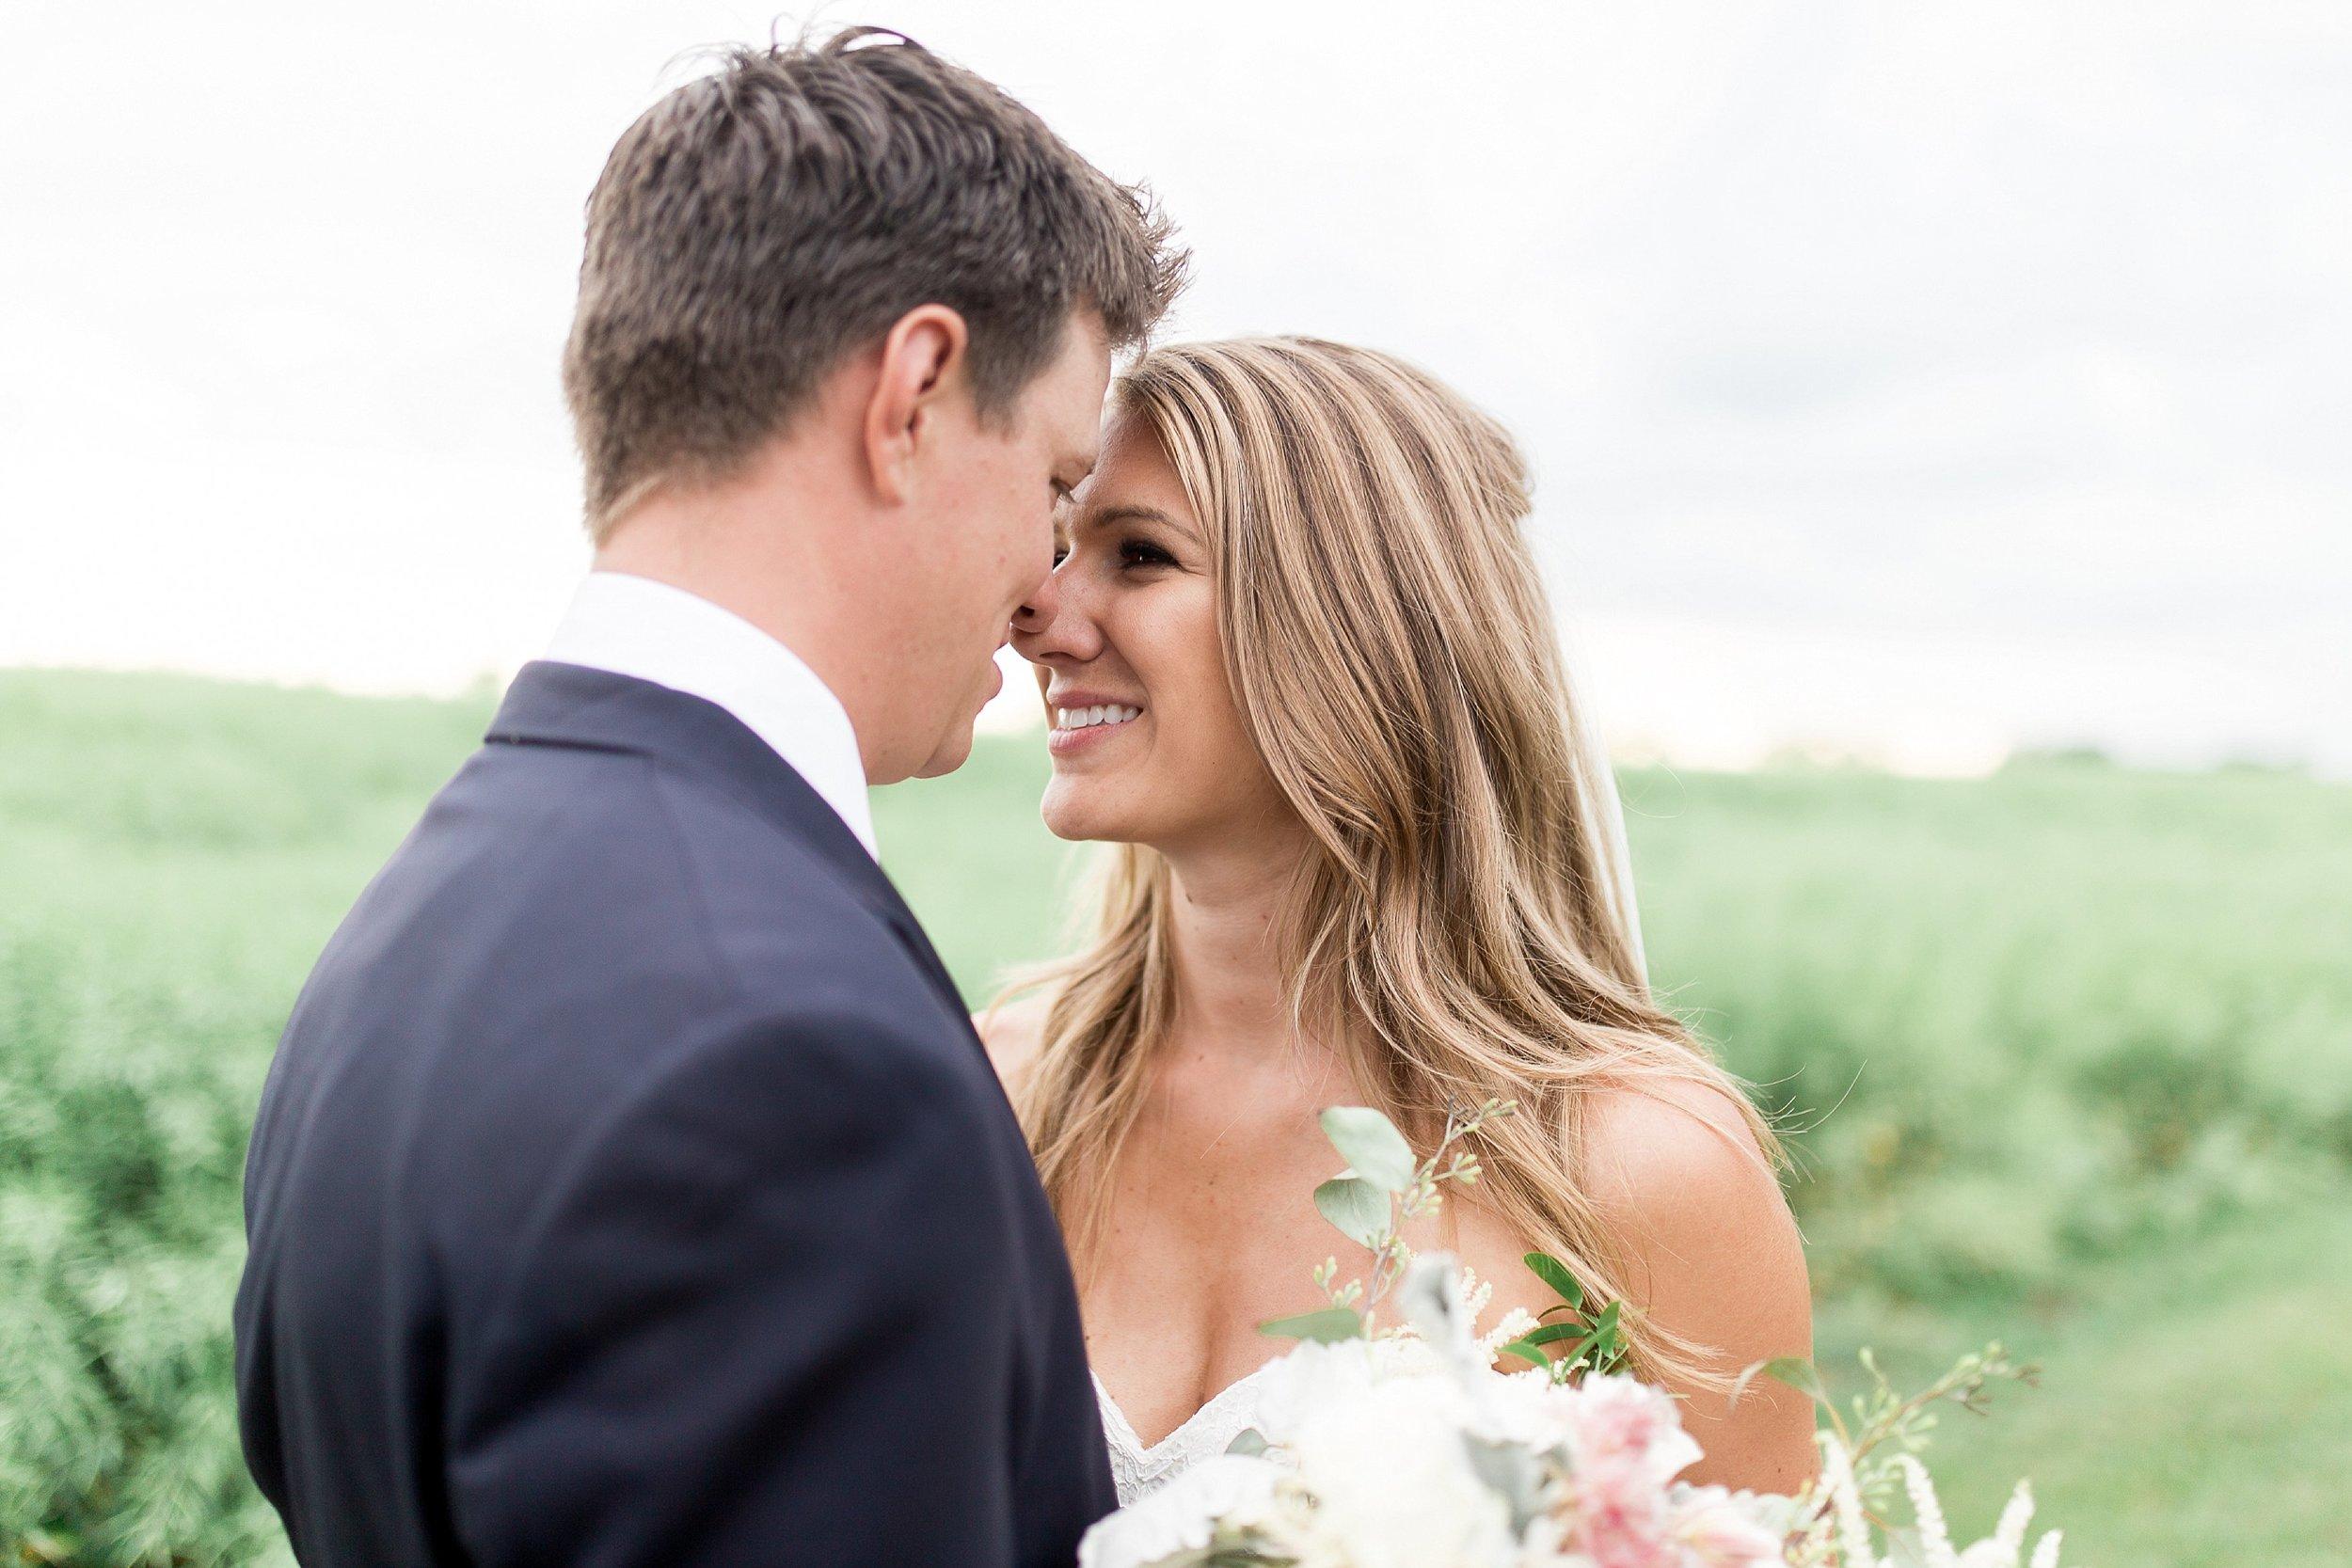 Winnipeg wedding photographer   Keila Marie Photography   Bride and groom portraits  Garden inspired wedding